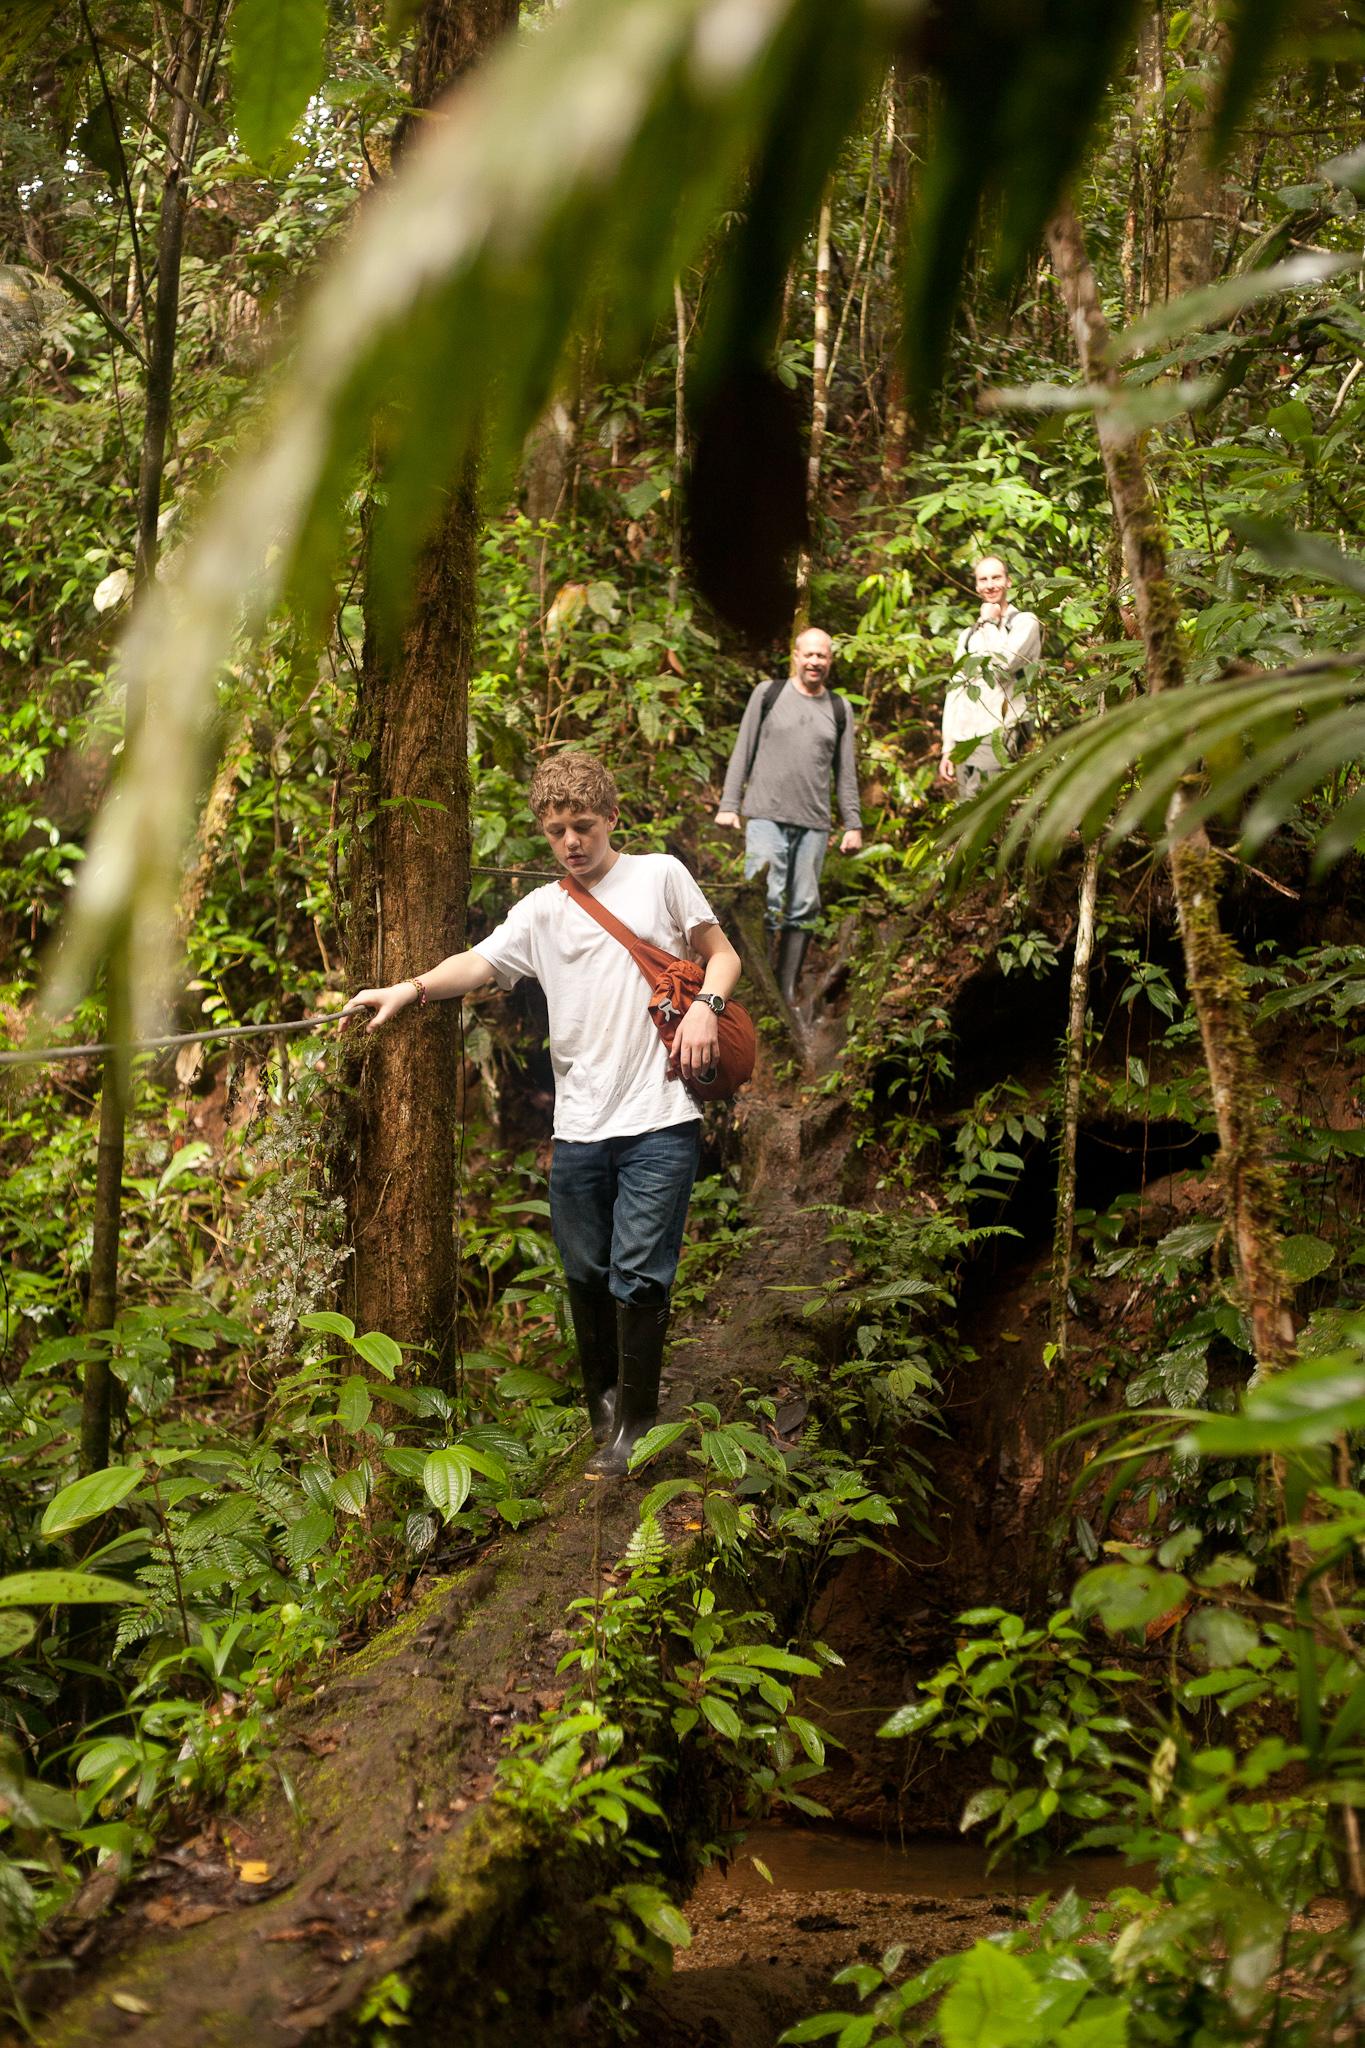 EcuadorQuito&Amazon_forwebsite2015_Jan2010_jenniferleahy-011.jpg